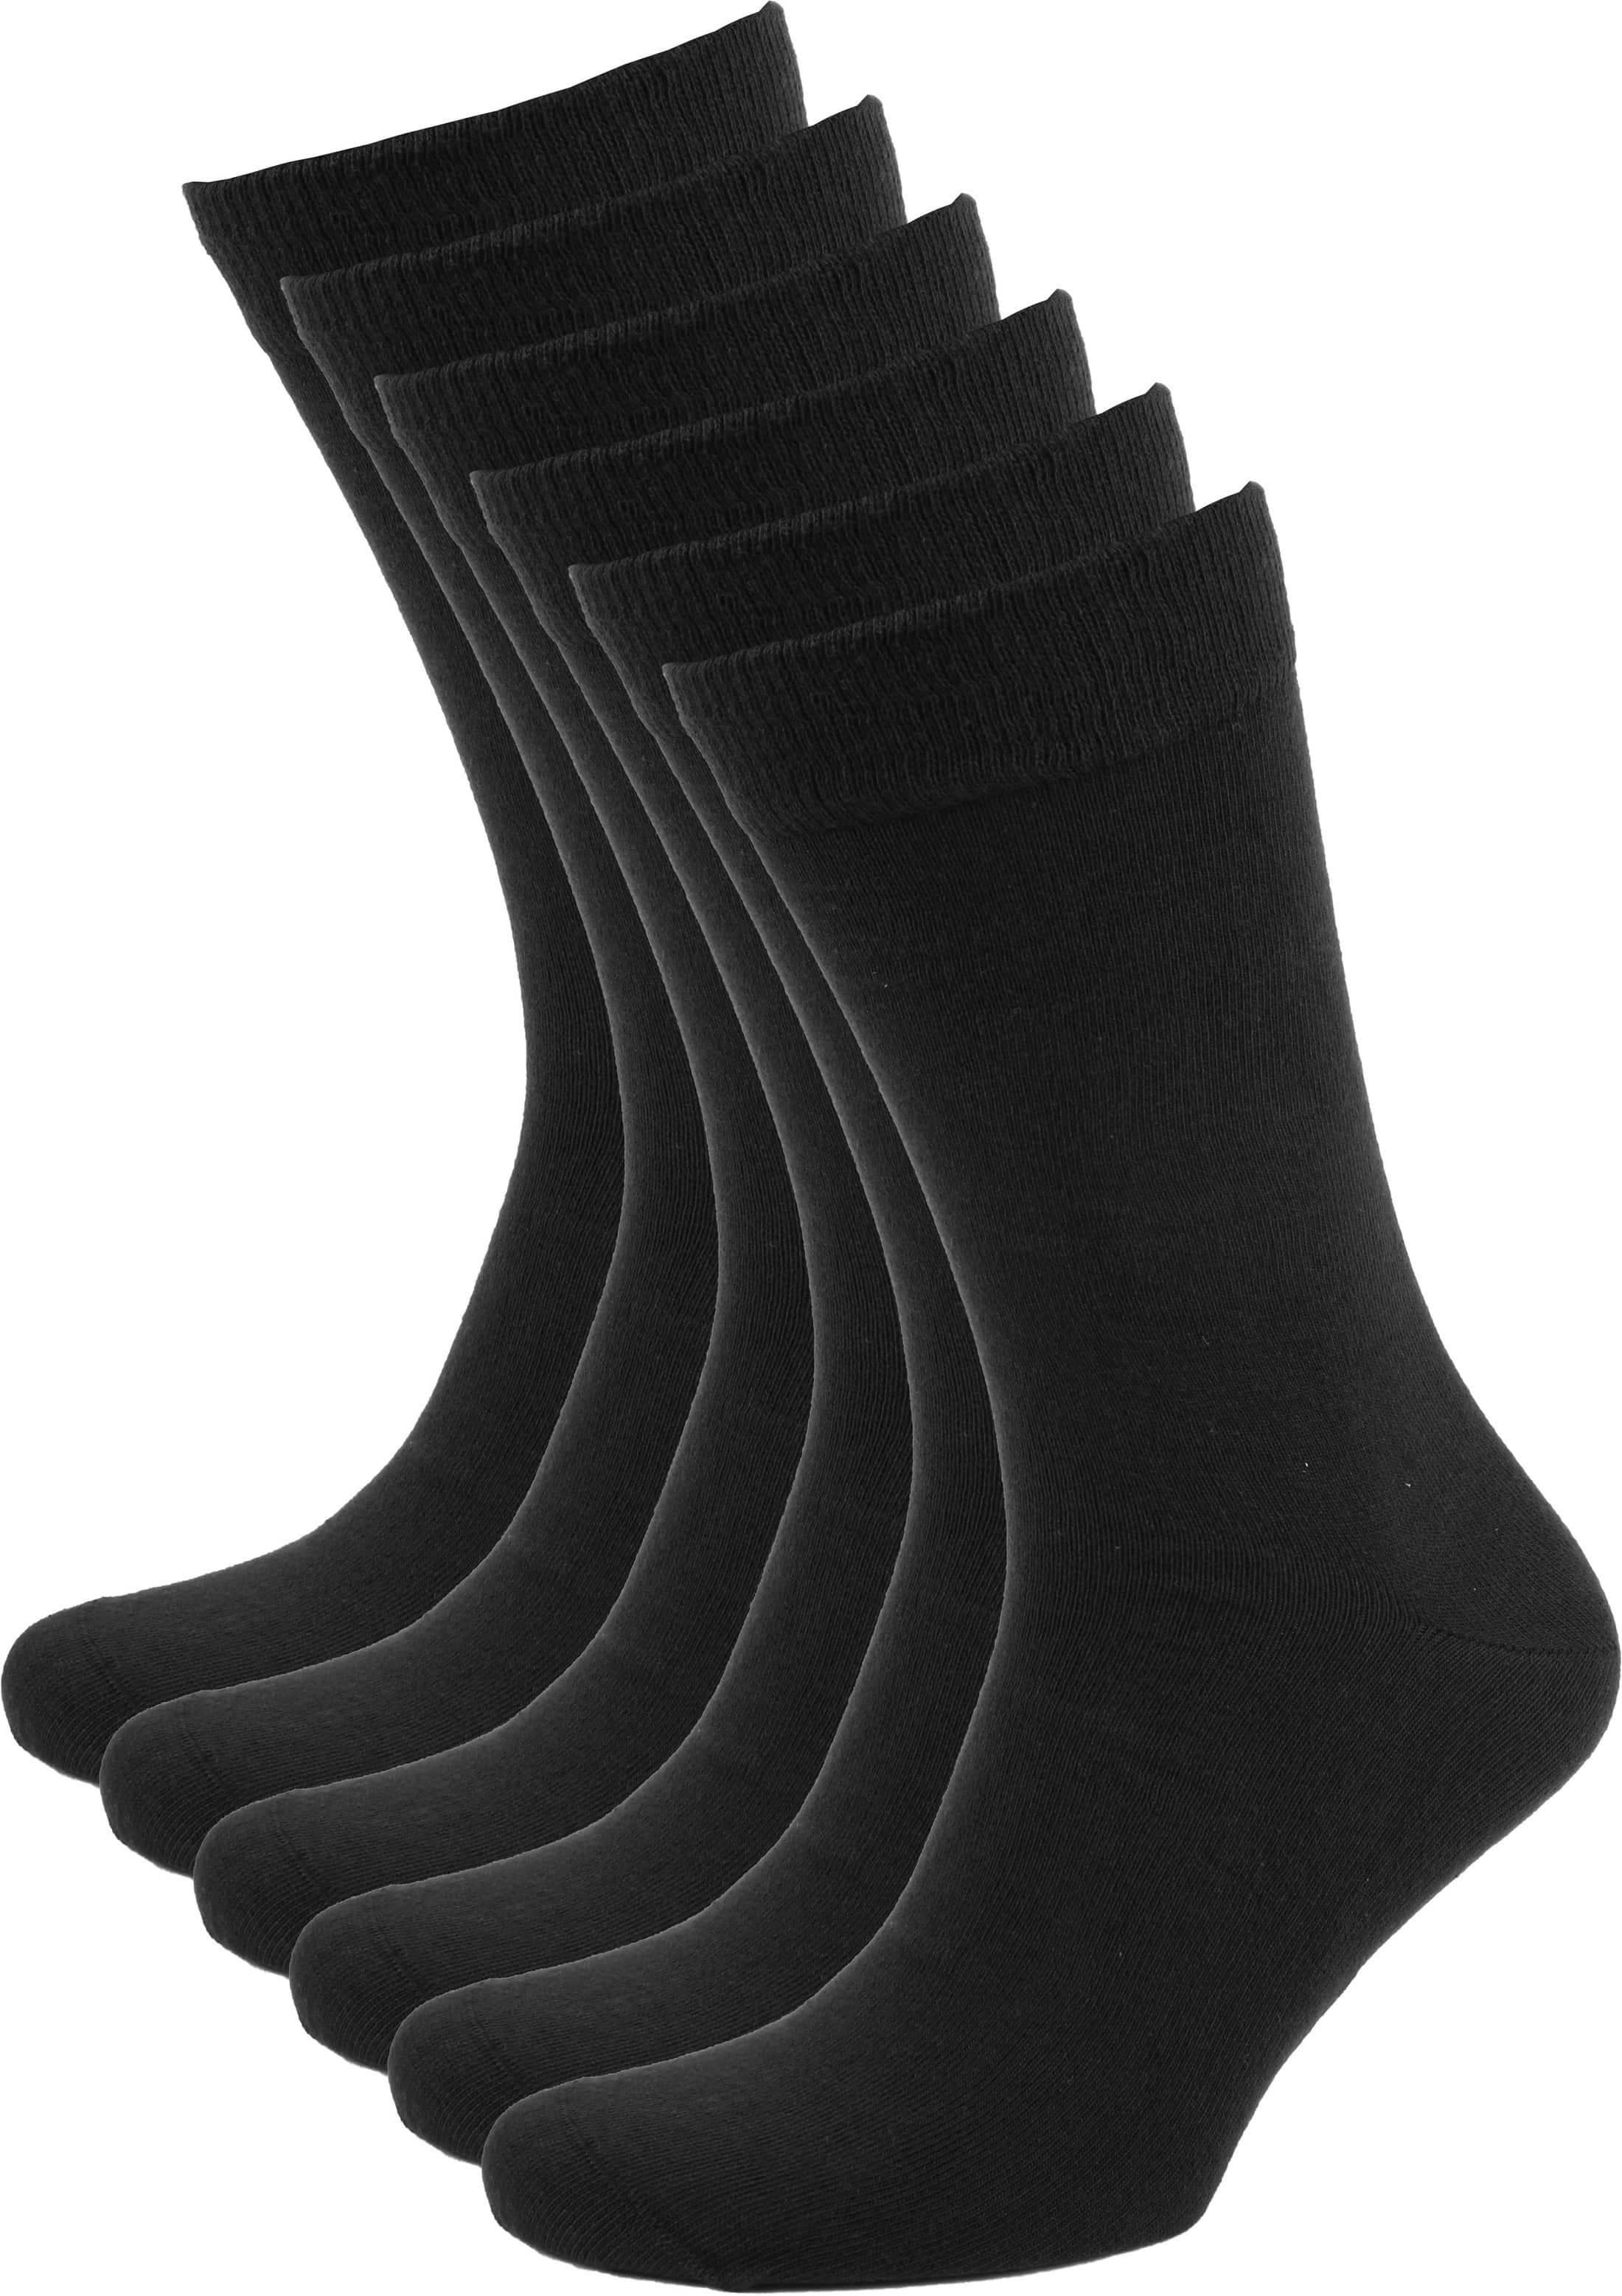 Suitable Bio-Baumwolle Socken Schwarz 6-Pack foto 0